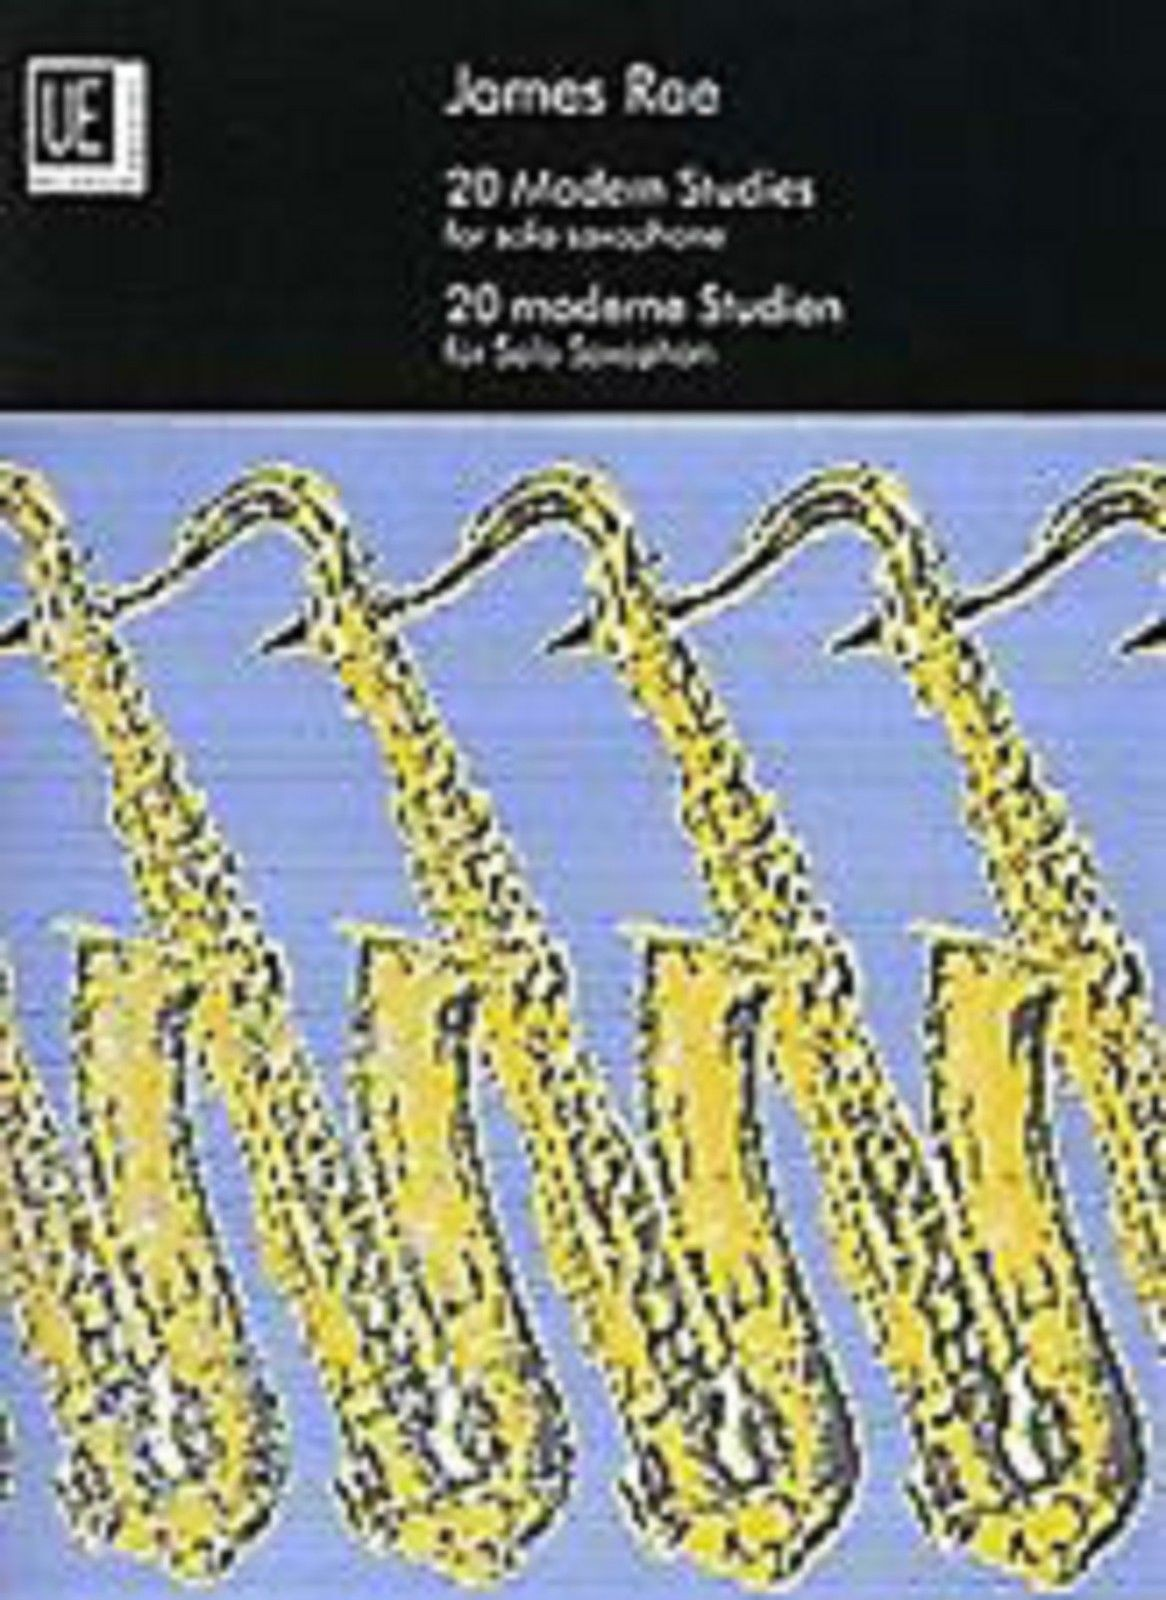 20 Modern Studies for Solo Saxophone James Rae Sheet Music Book S02